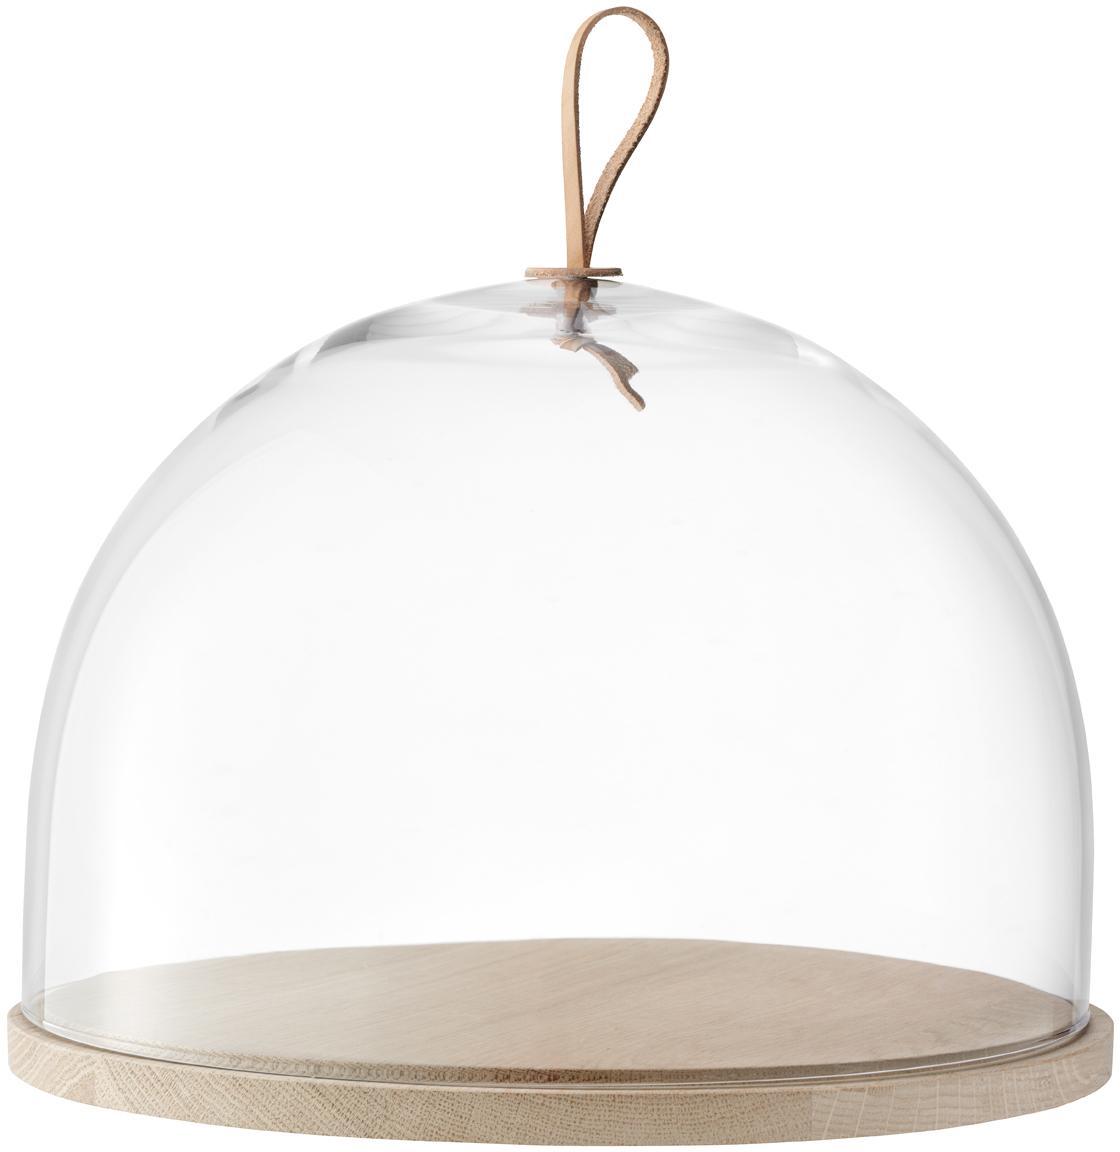 Mundgeblasene Cloche Ivalo, Glocke: Glas, Platte: Eschenholz, Henkel: Leder, Transparent, Braun, Ø 32 x H 23 cm